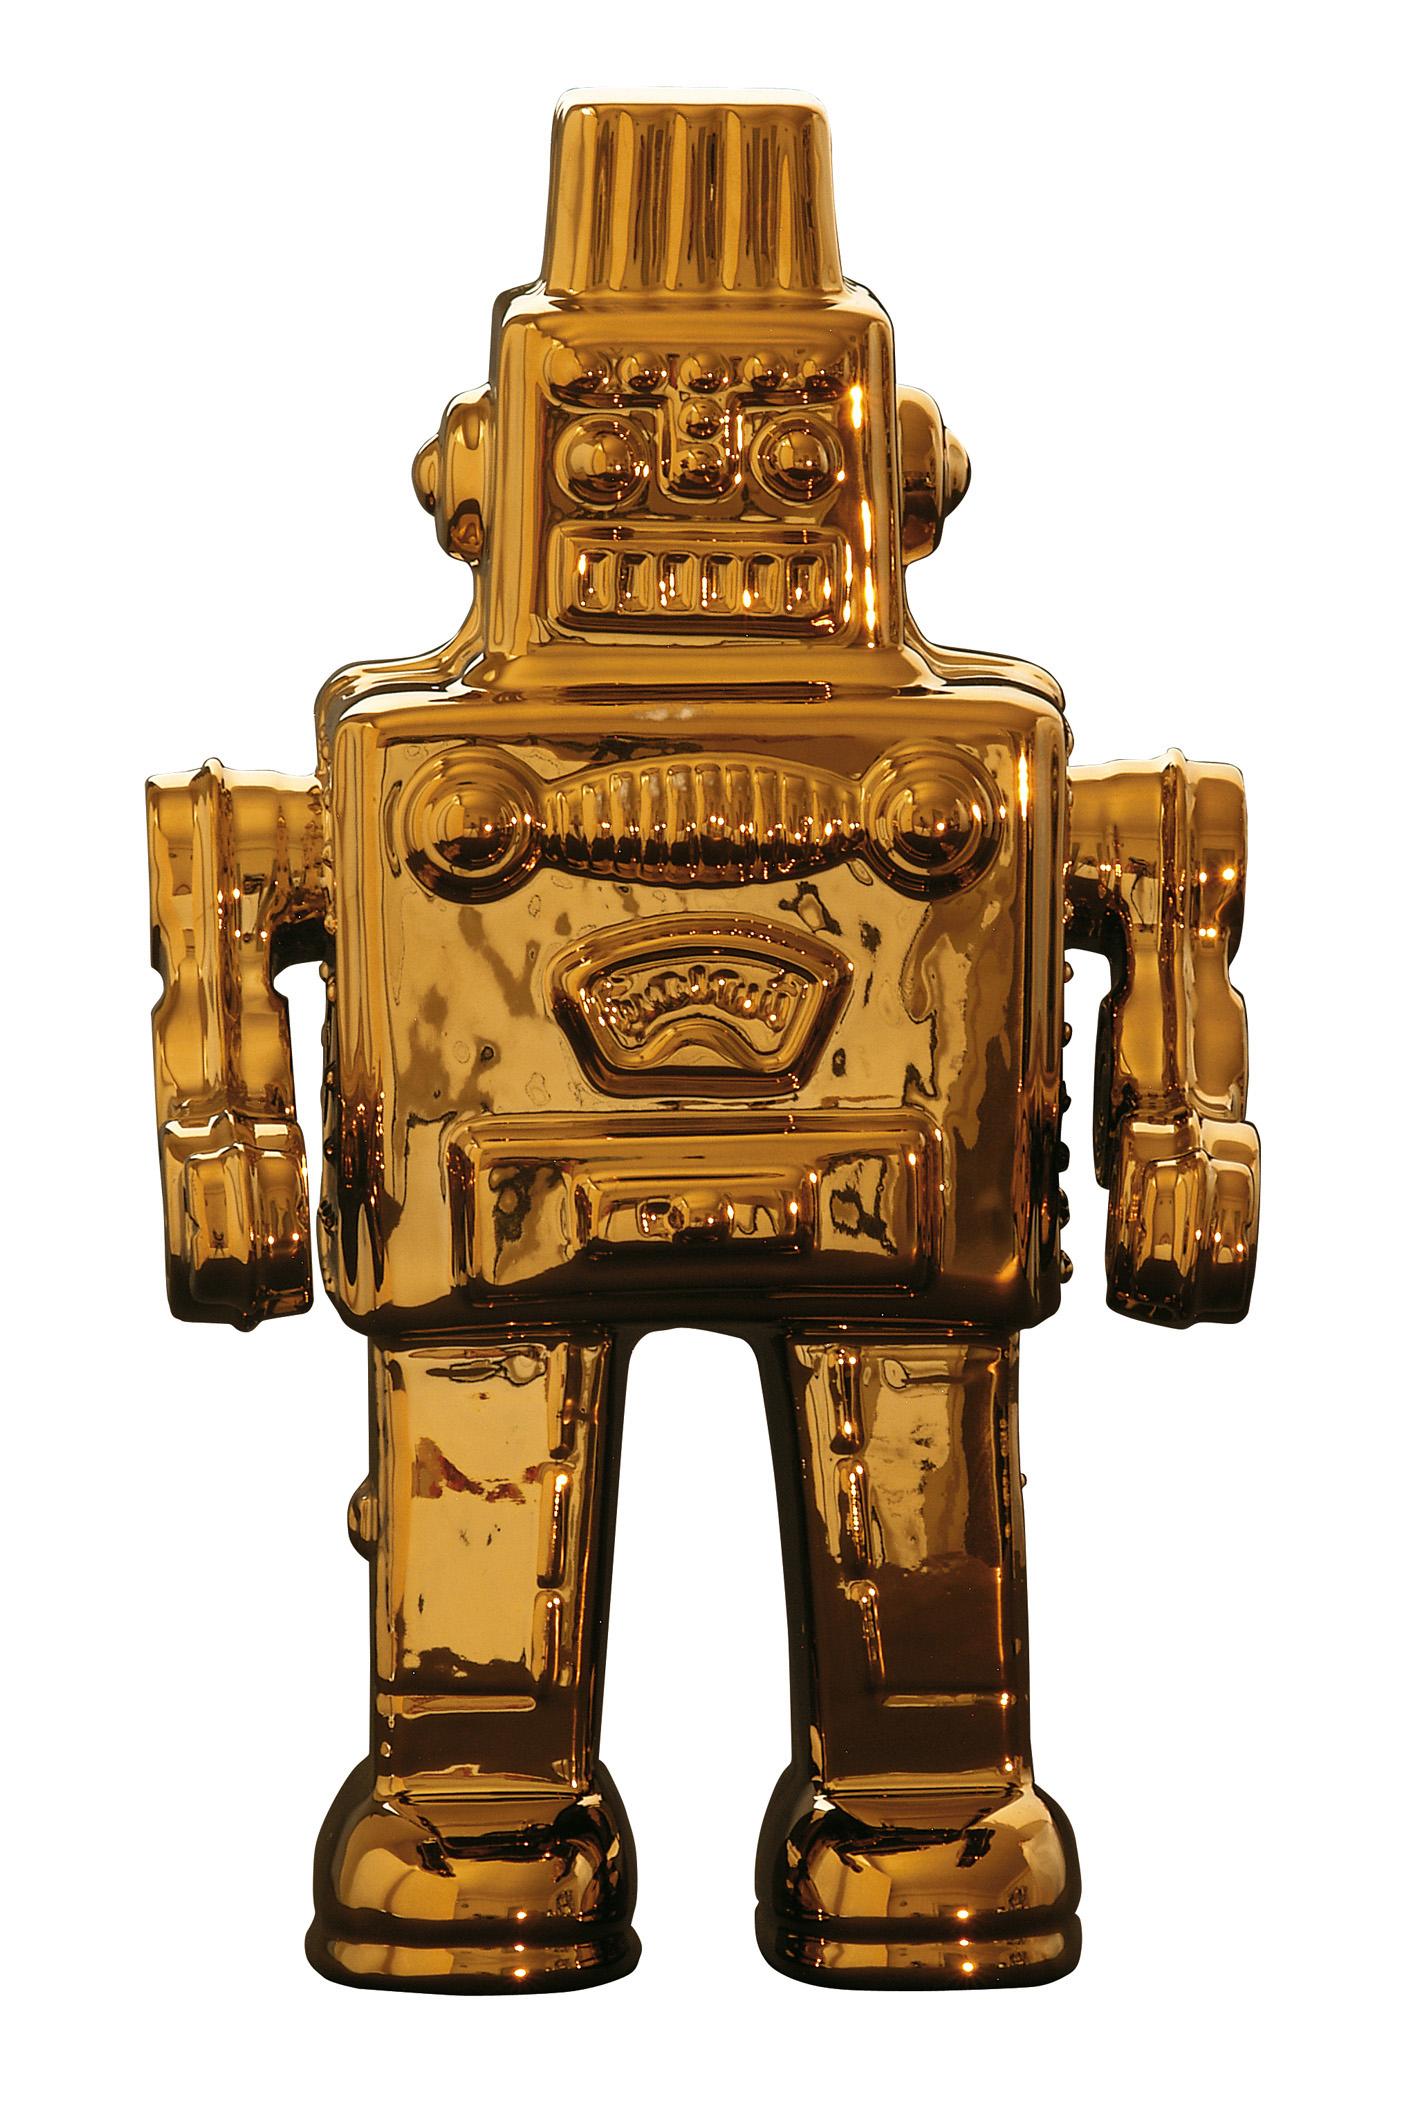 'MY ROBOT'